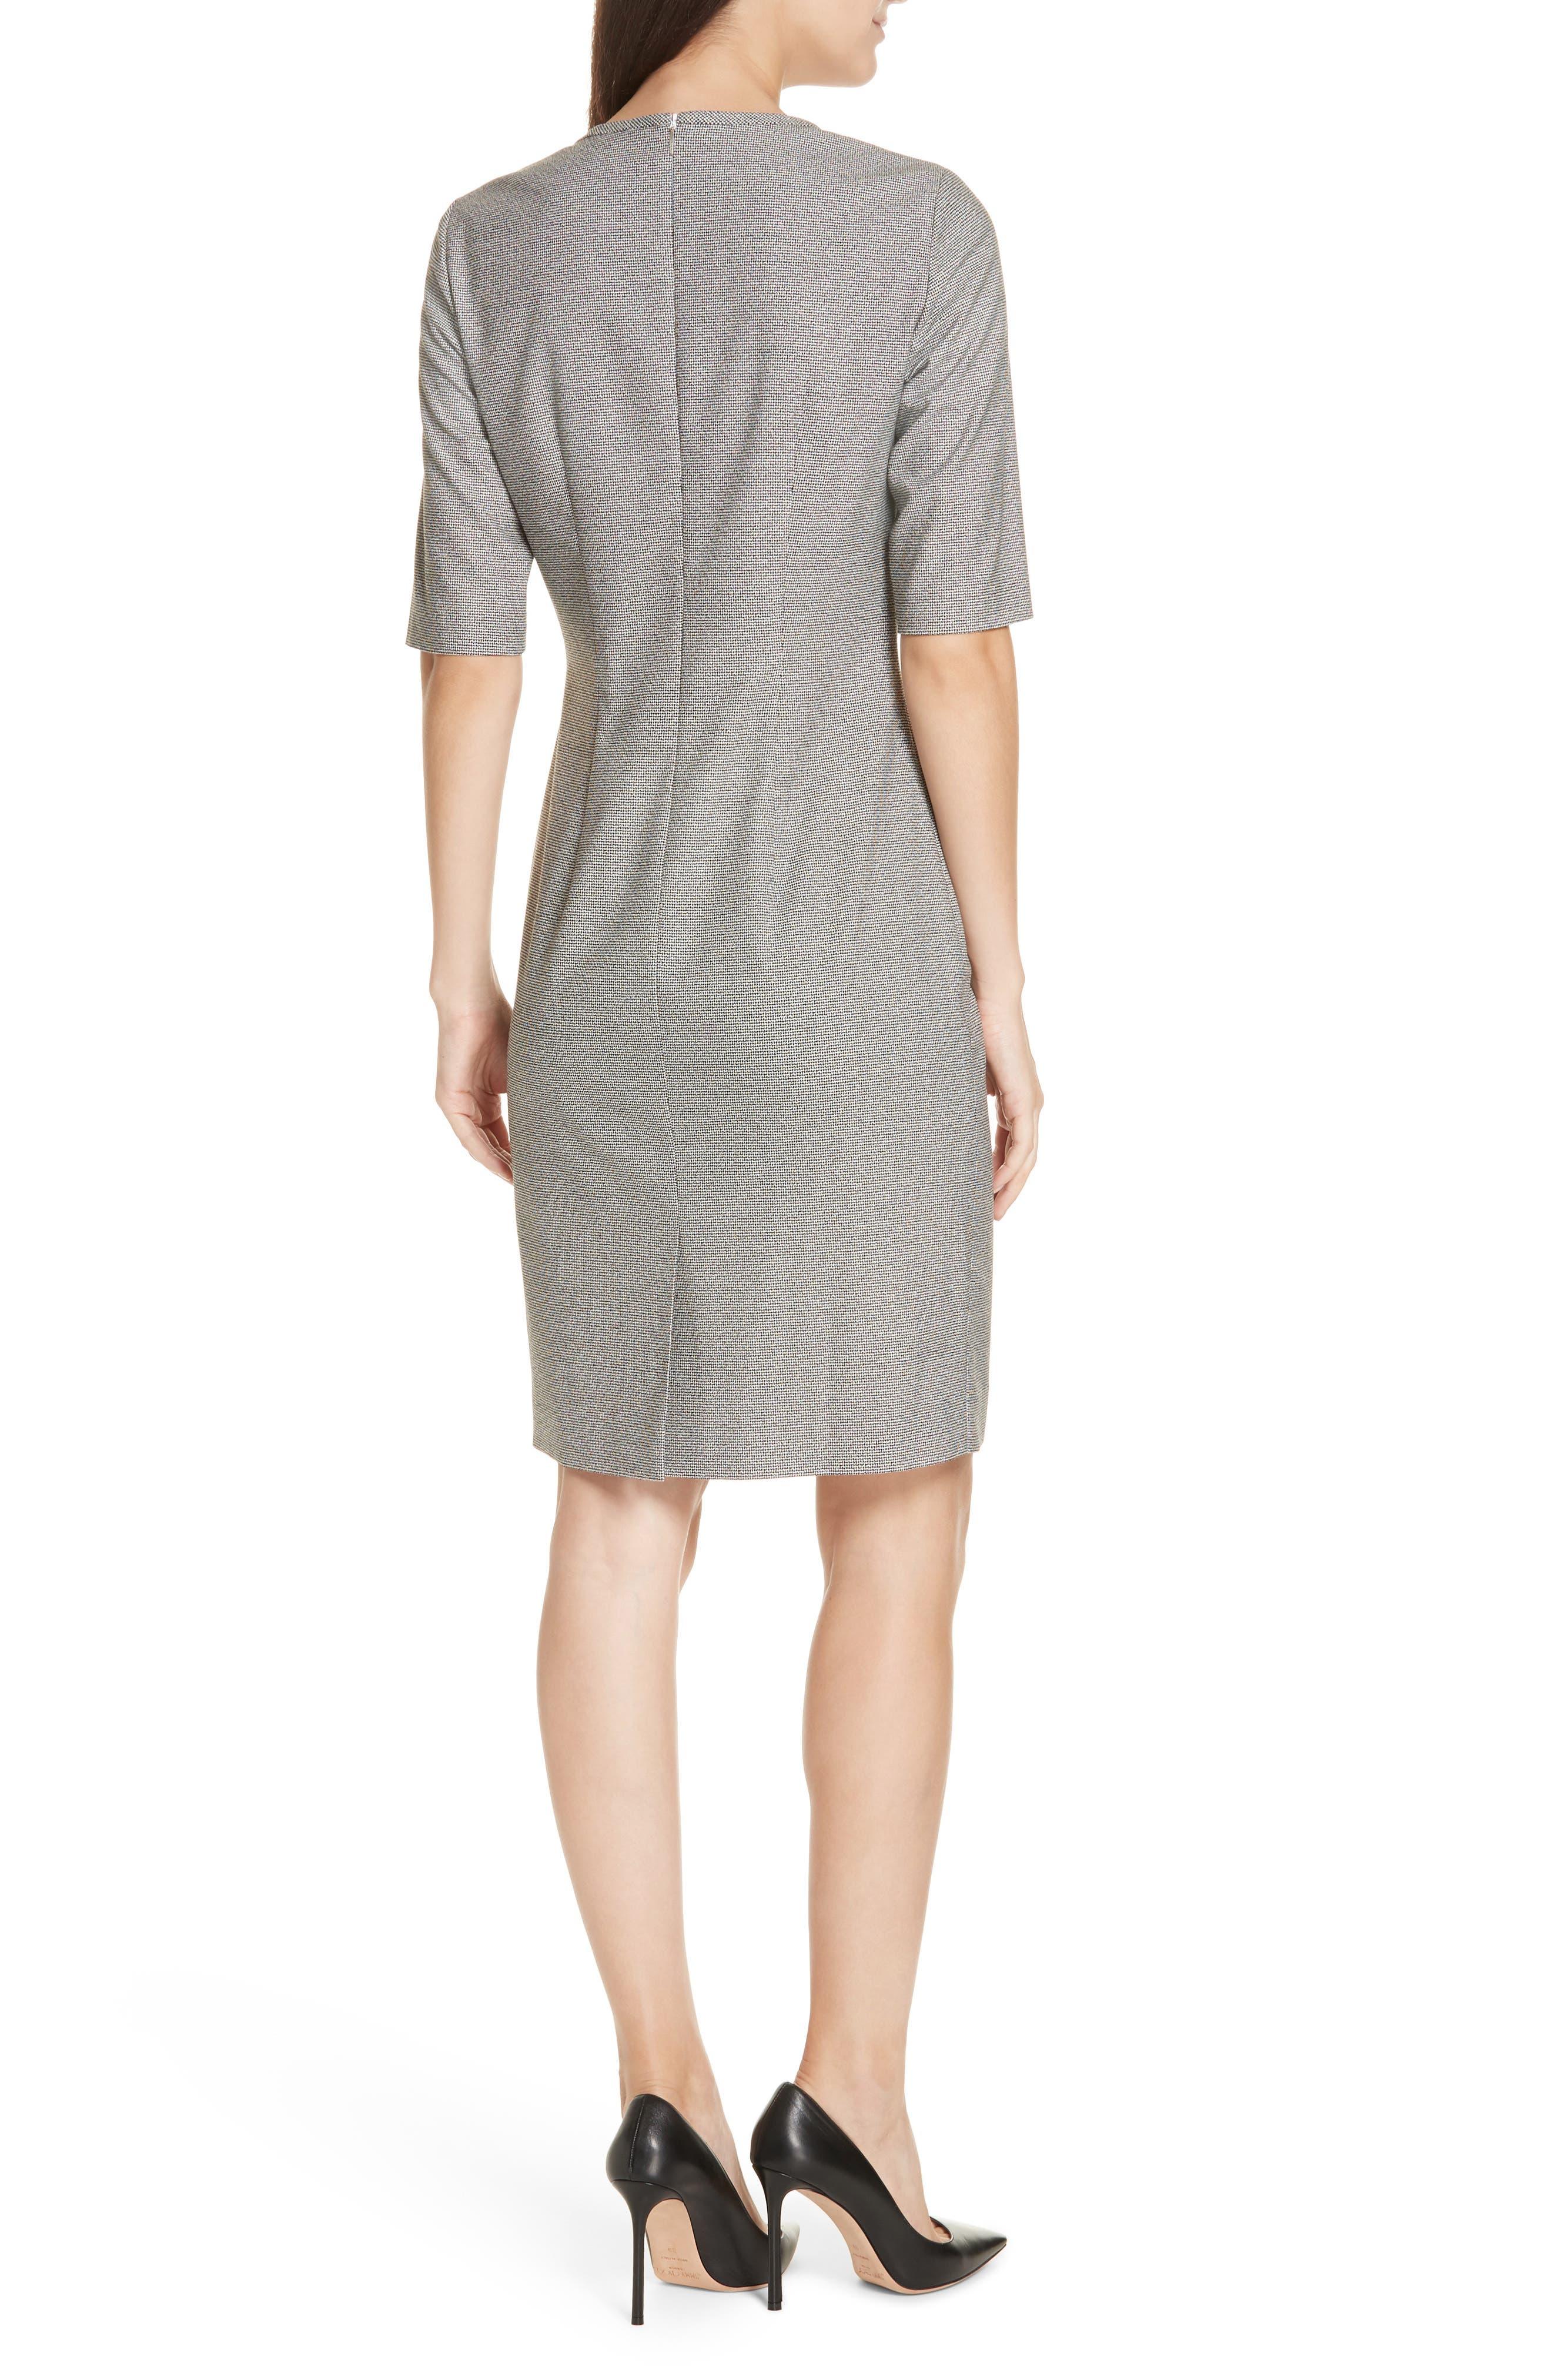 Dirafia Blurred Optic Dress,                             Alternate thumbnail 2, color,                             BLACK FANTASY